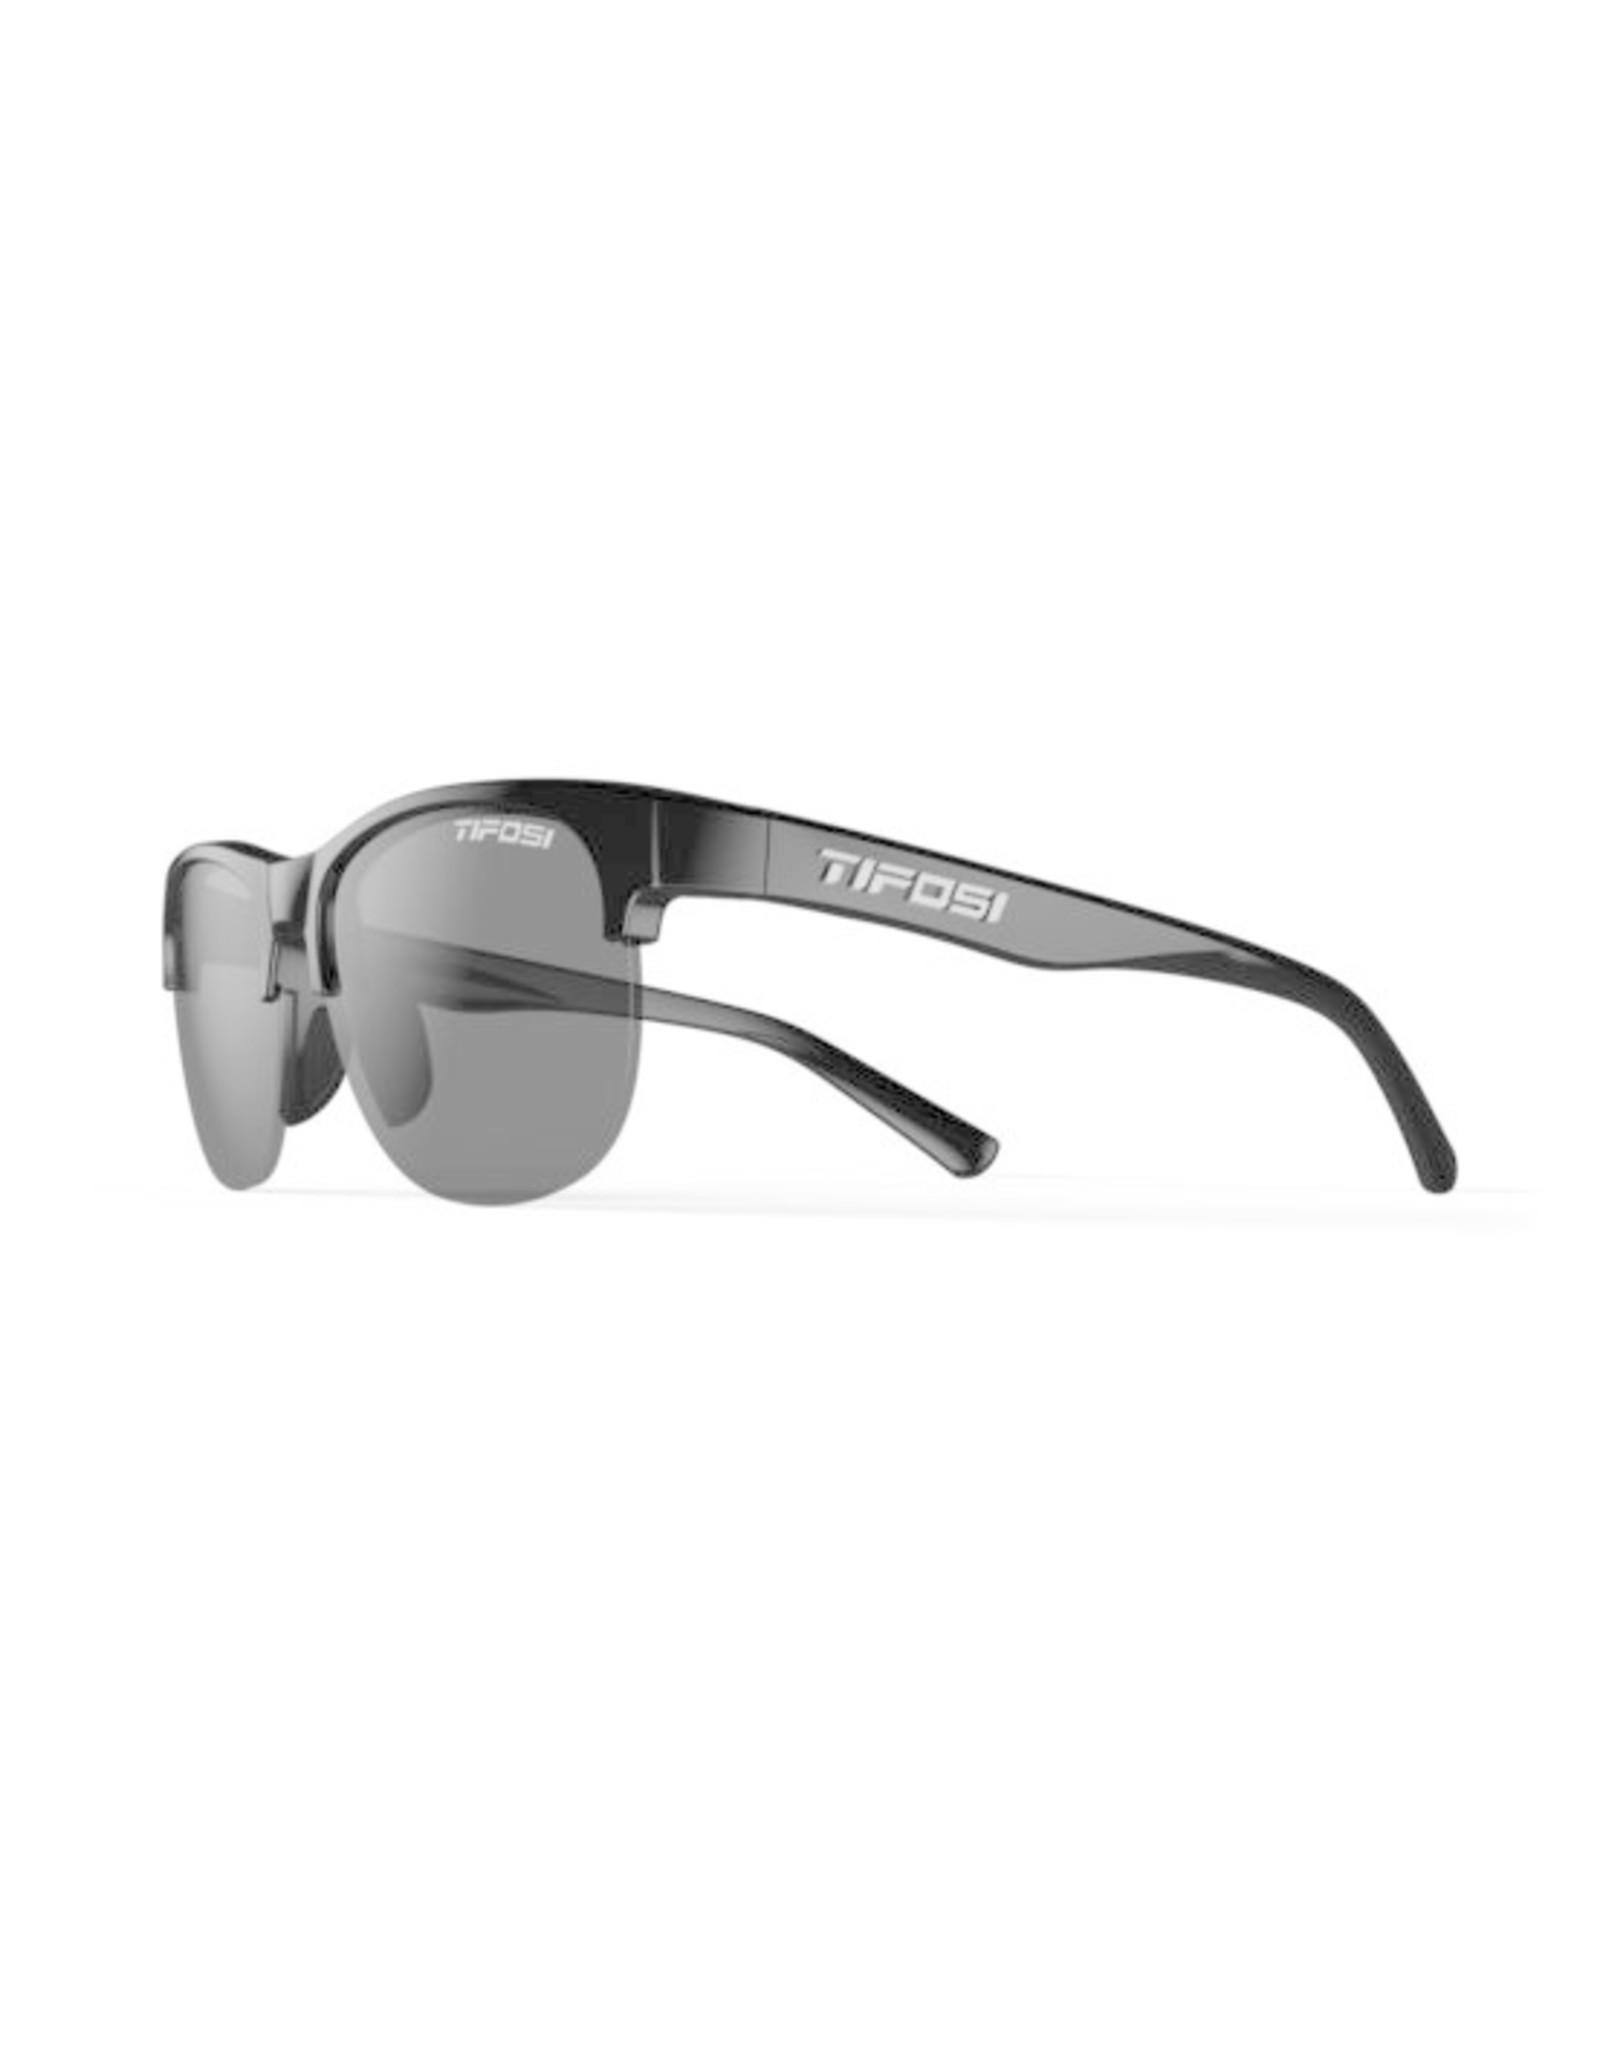 Tifosi Optics Tifosi Swank SL Single Lens